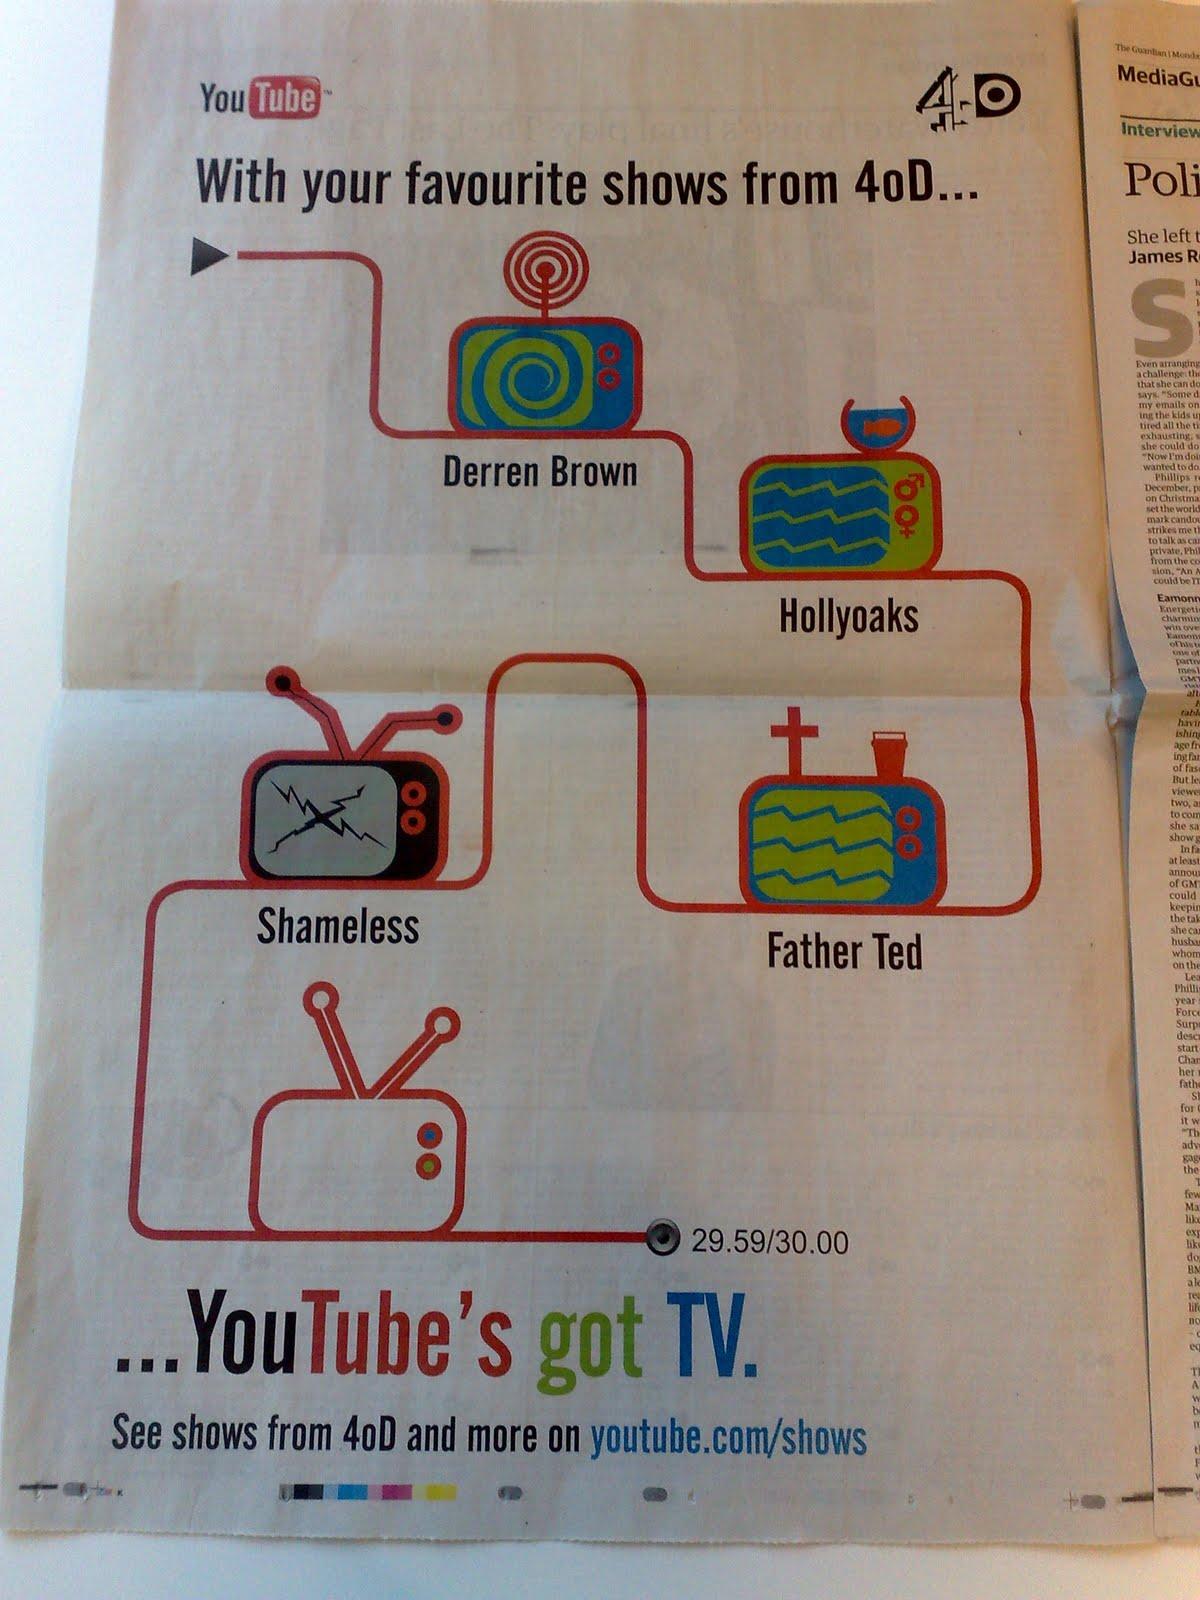 YouTube print ad in Guardian newspaper PHOTO